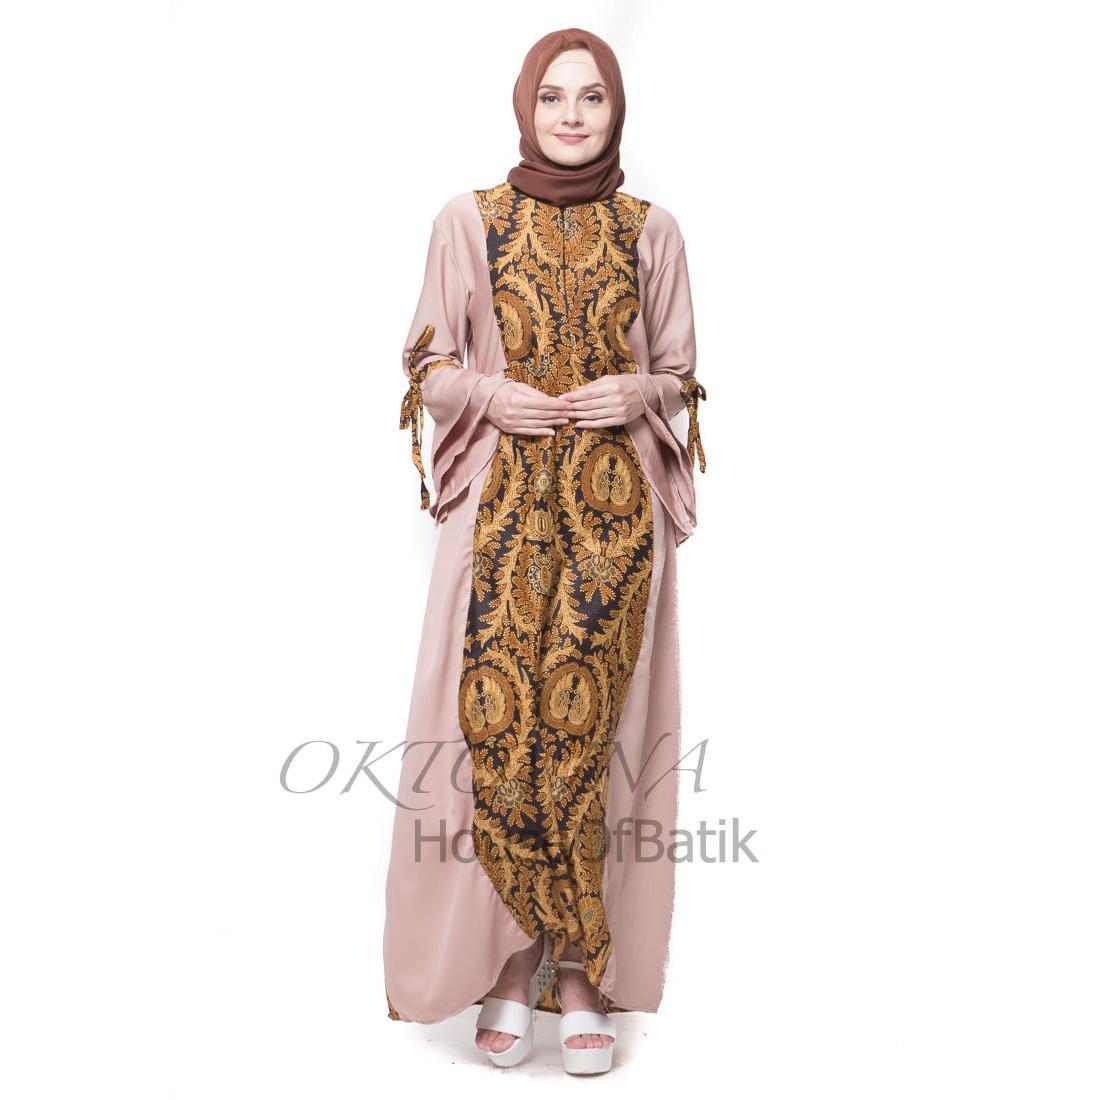 Oktovina-HouseOfBatik Gamis Batik Sogan Katun-Balotelli Klasik Srikaton - Sogan Batik GBSKB-5 - Cokelat Mocca / Gamis Batik / Gamis Wanita / Batik Wanita / Baju Batik